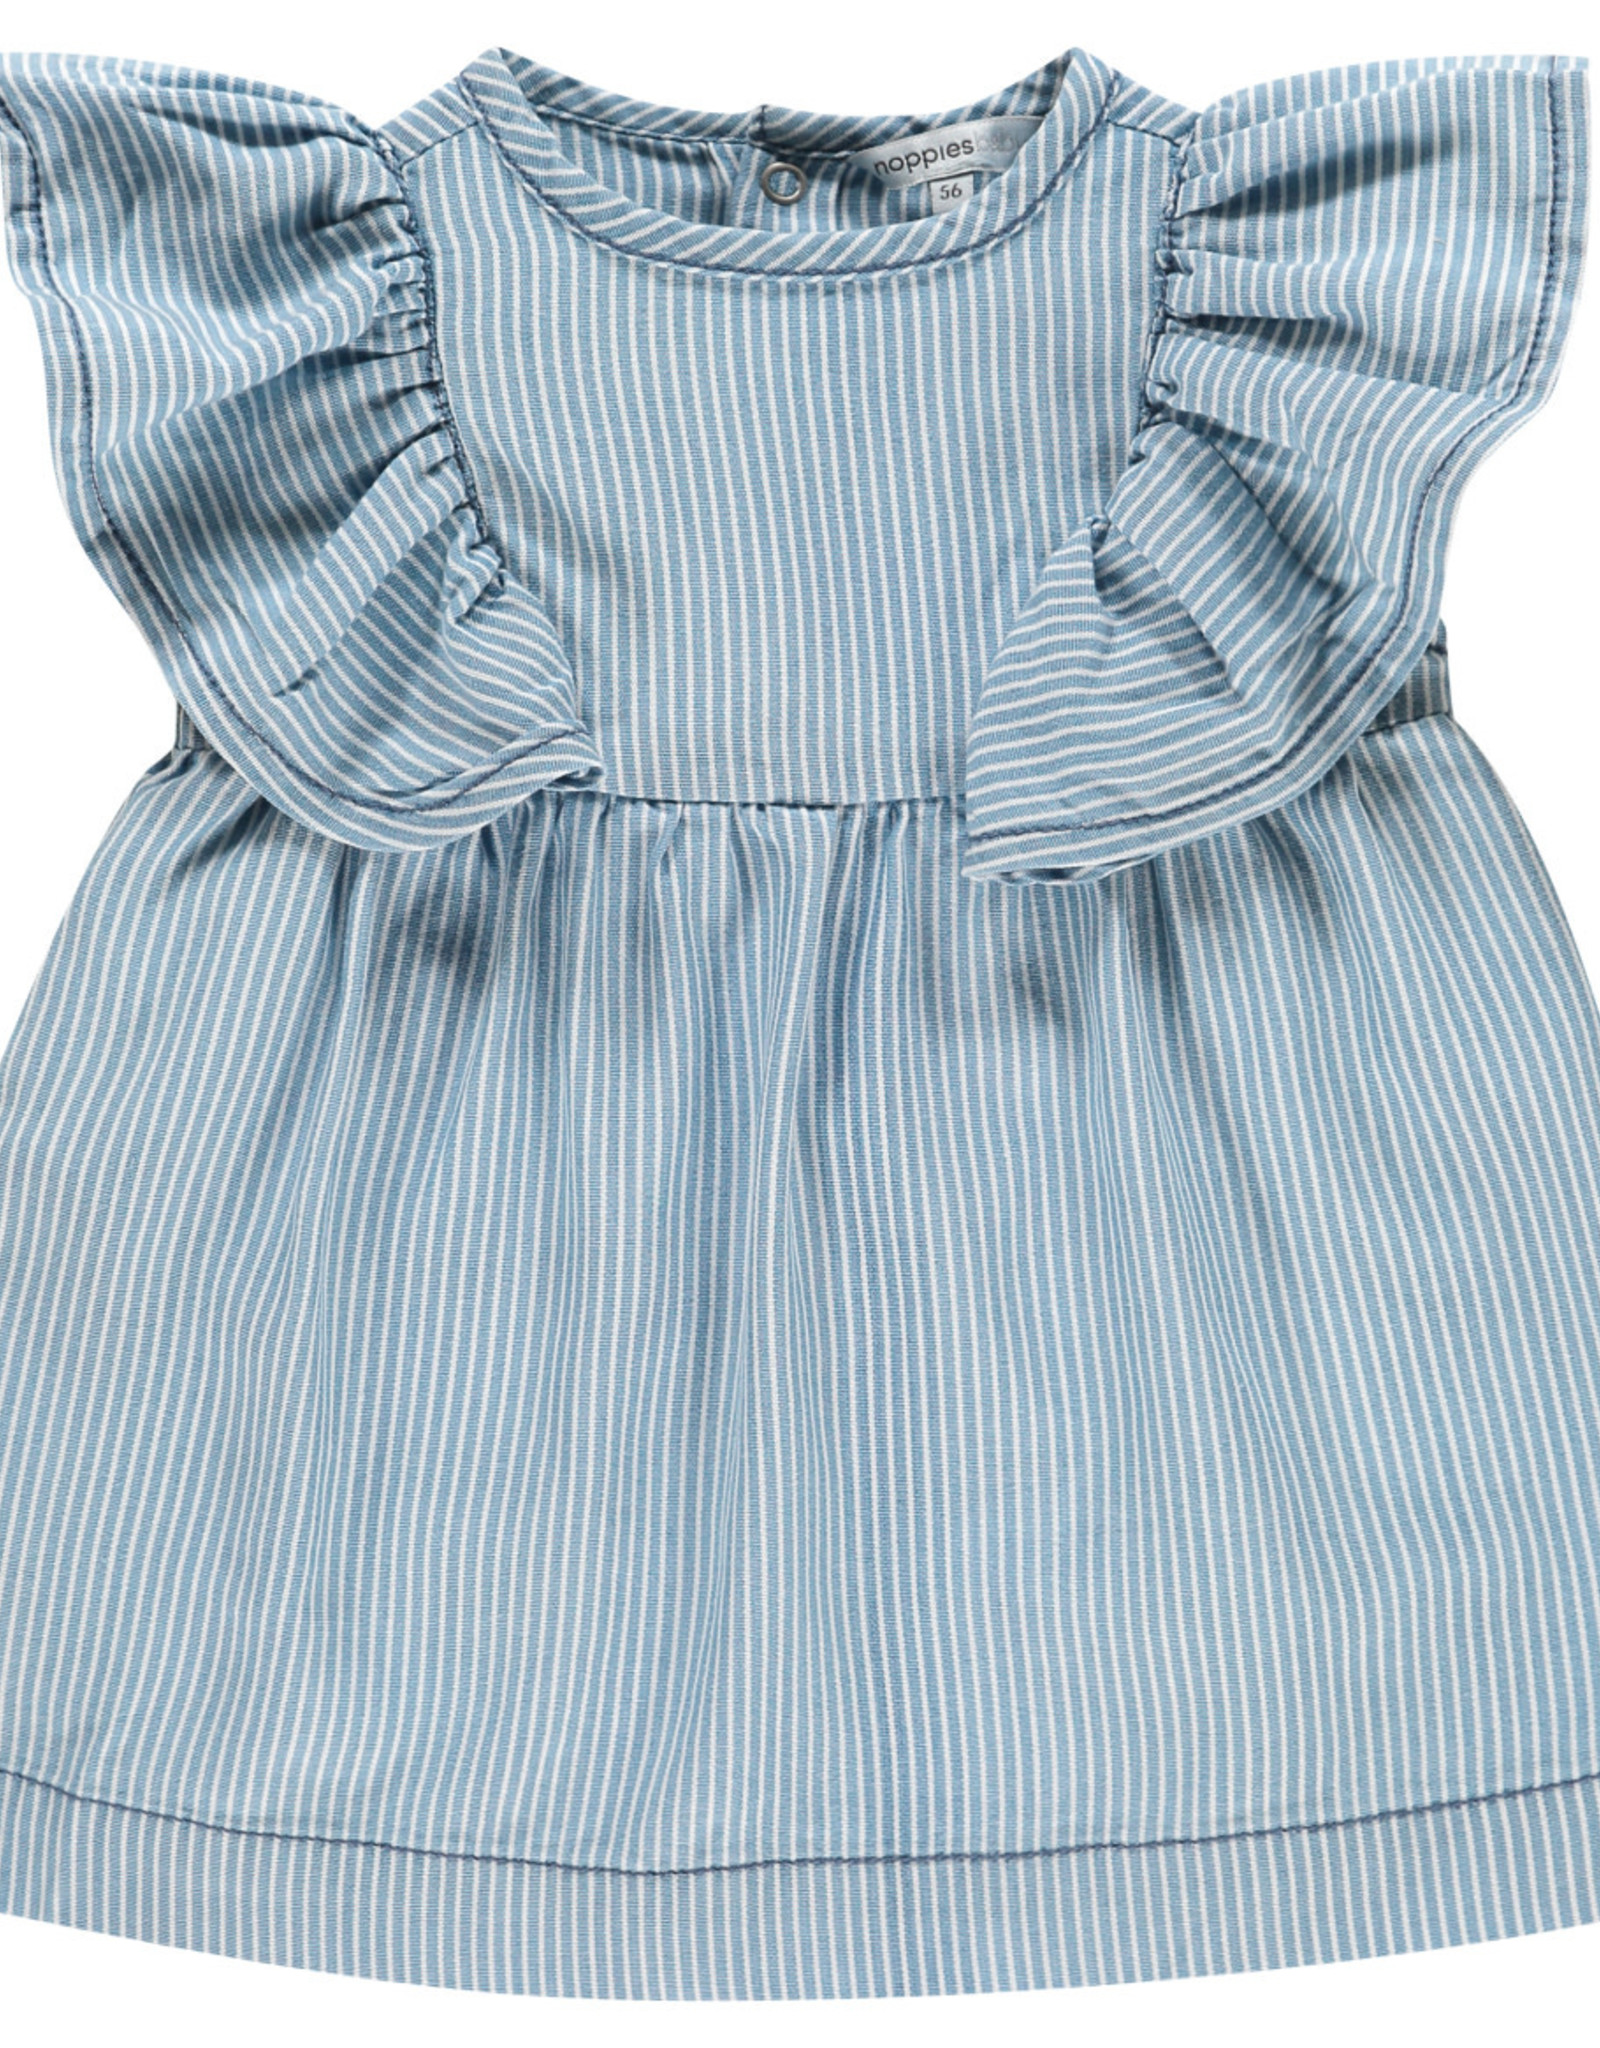 Noppies Carson City Dress